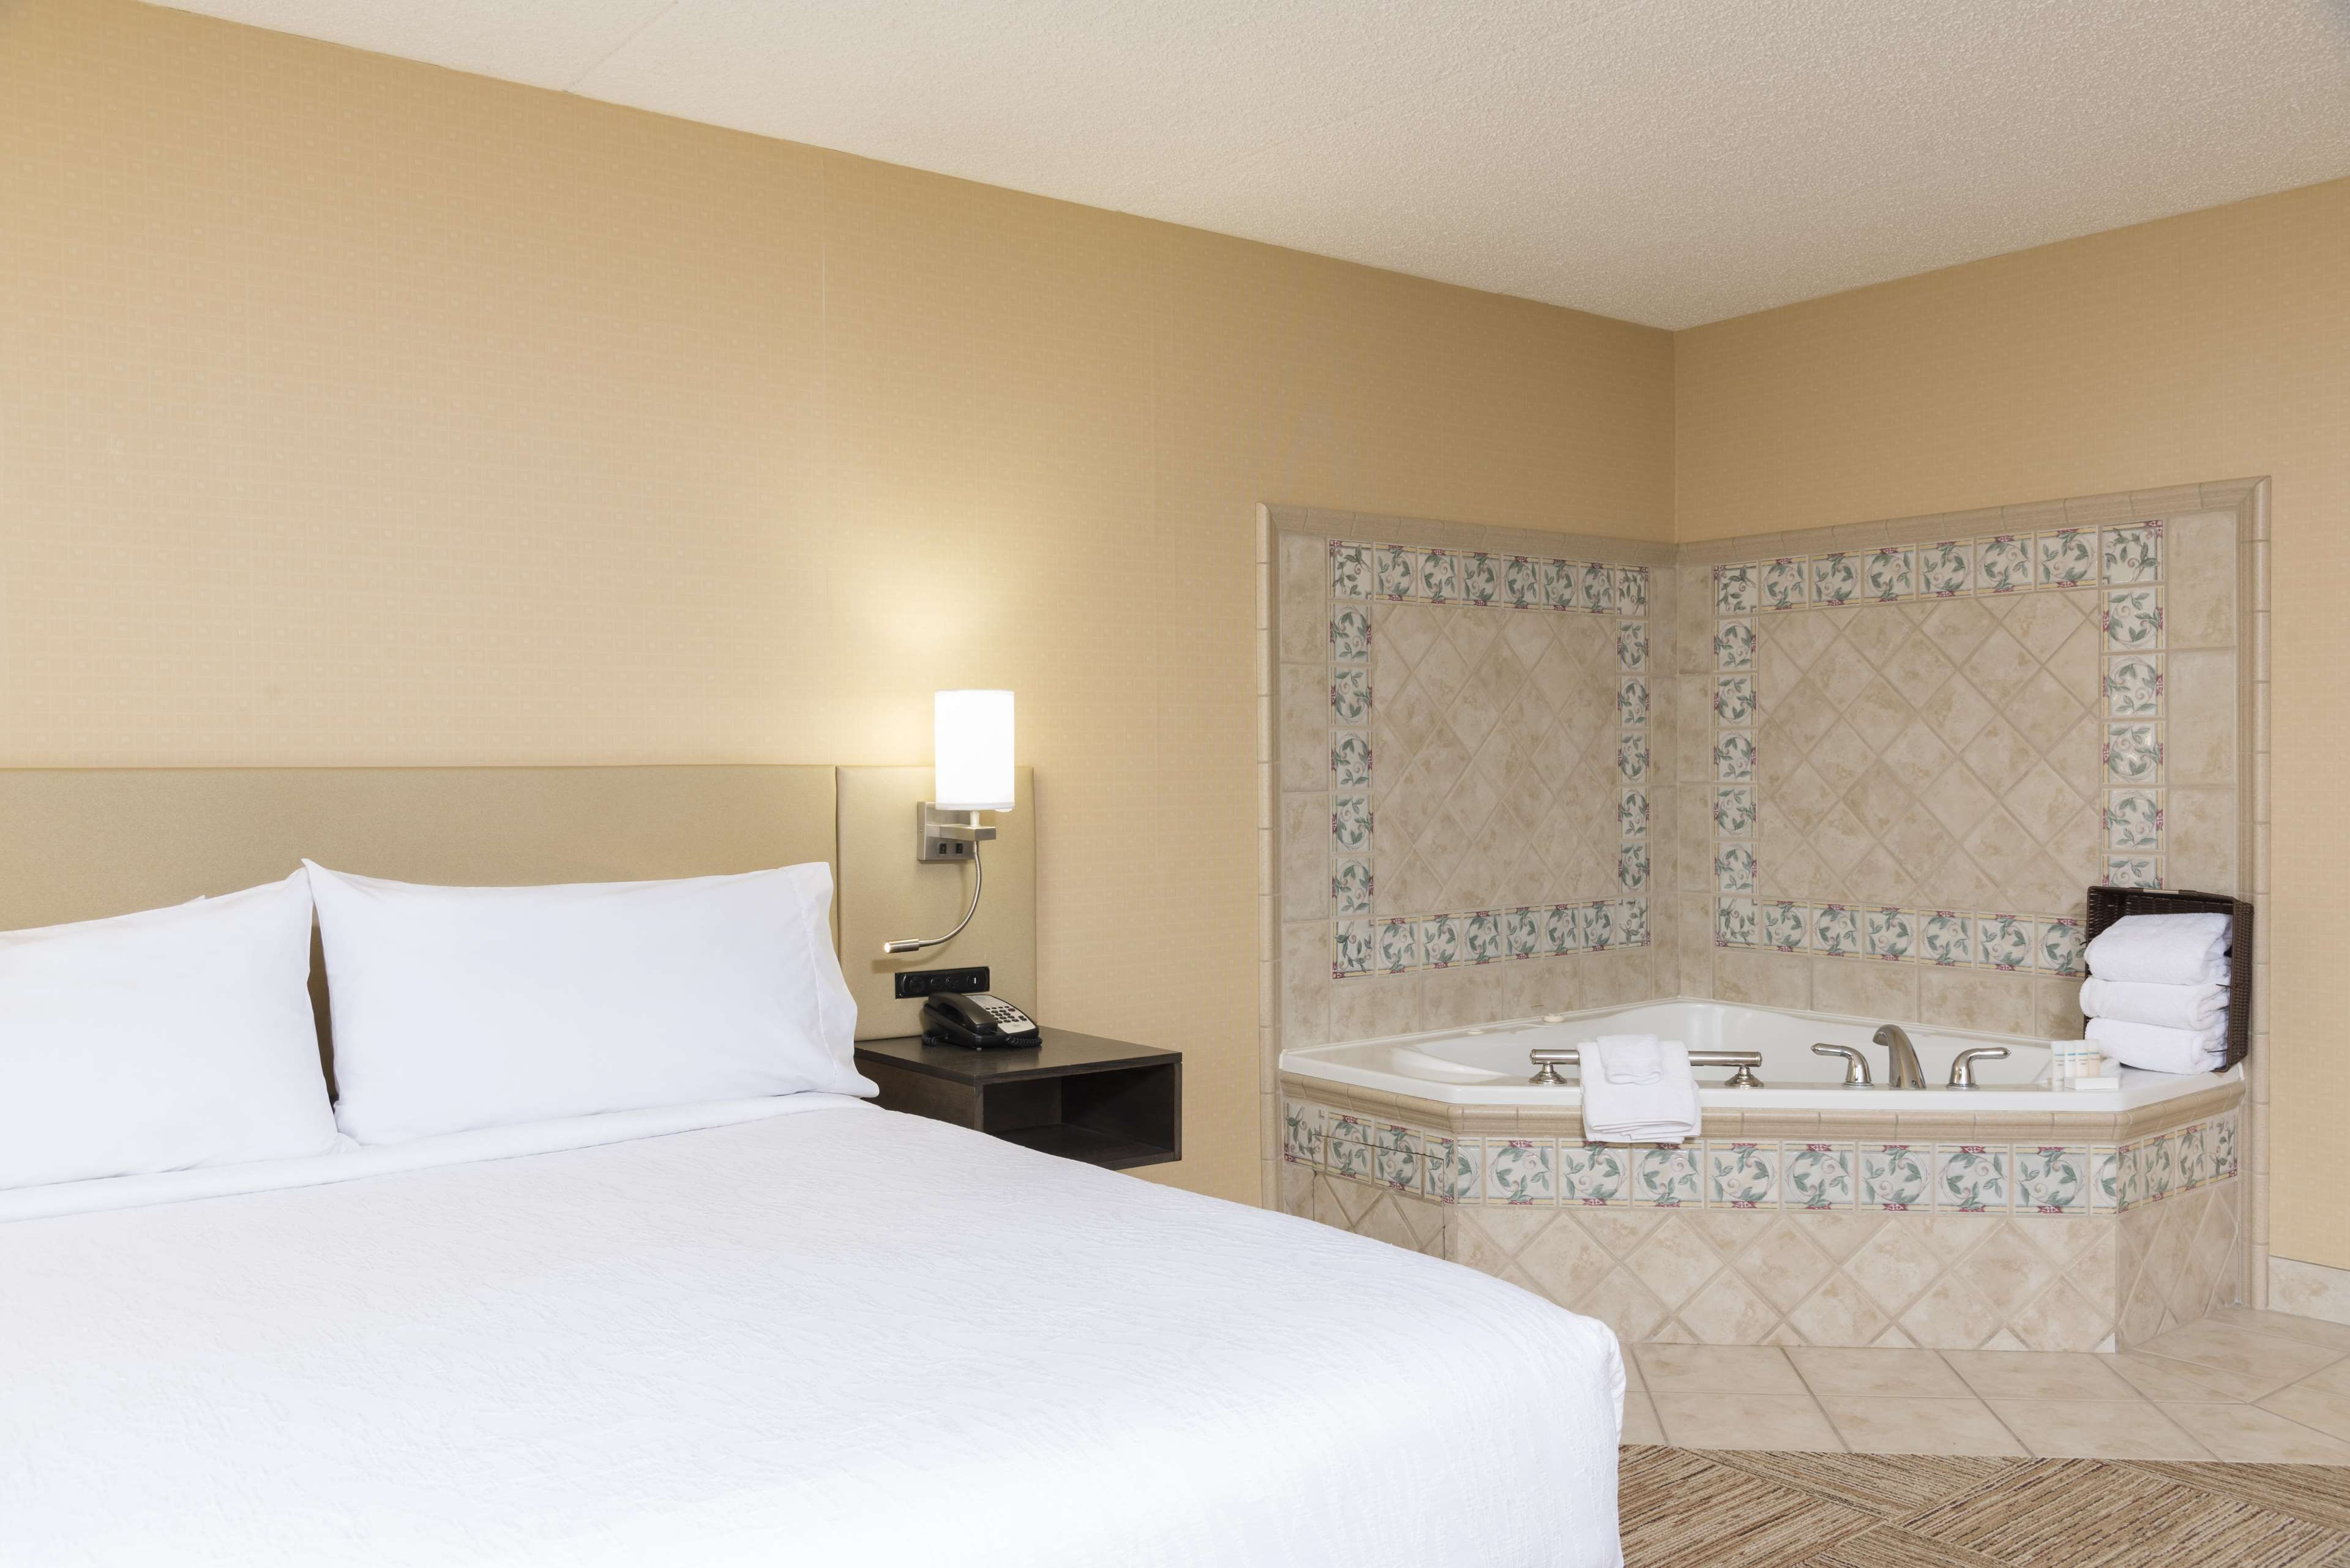 Hilton Garden Inn West Lafayette Wabash Landing image 27